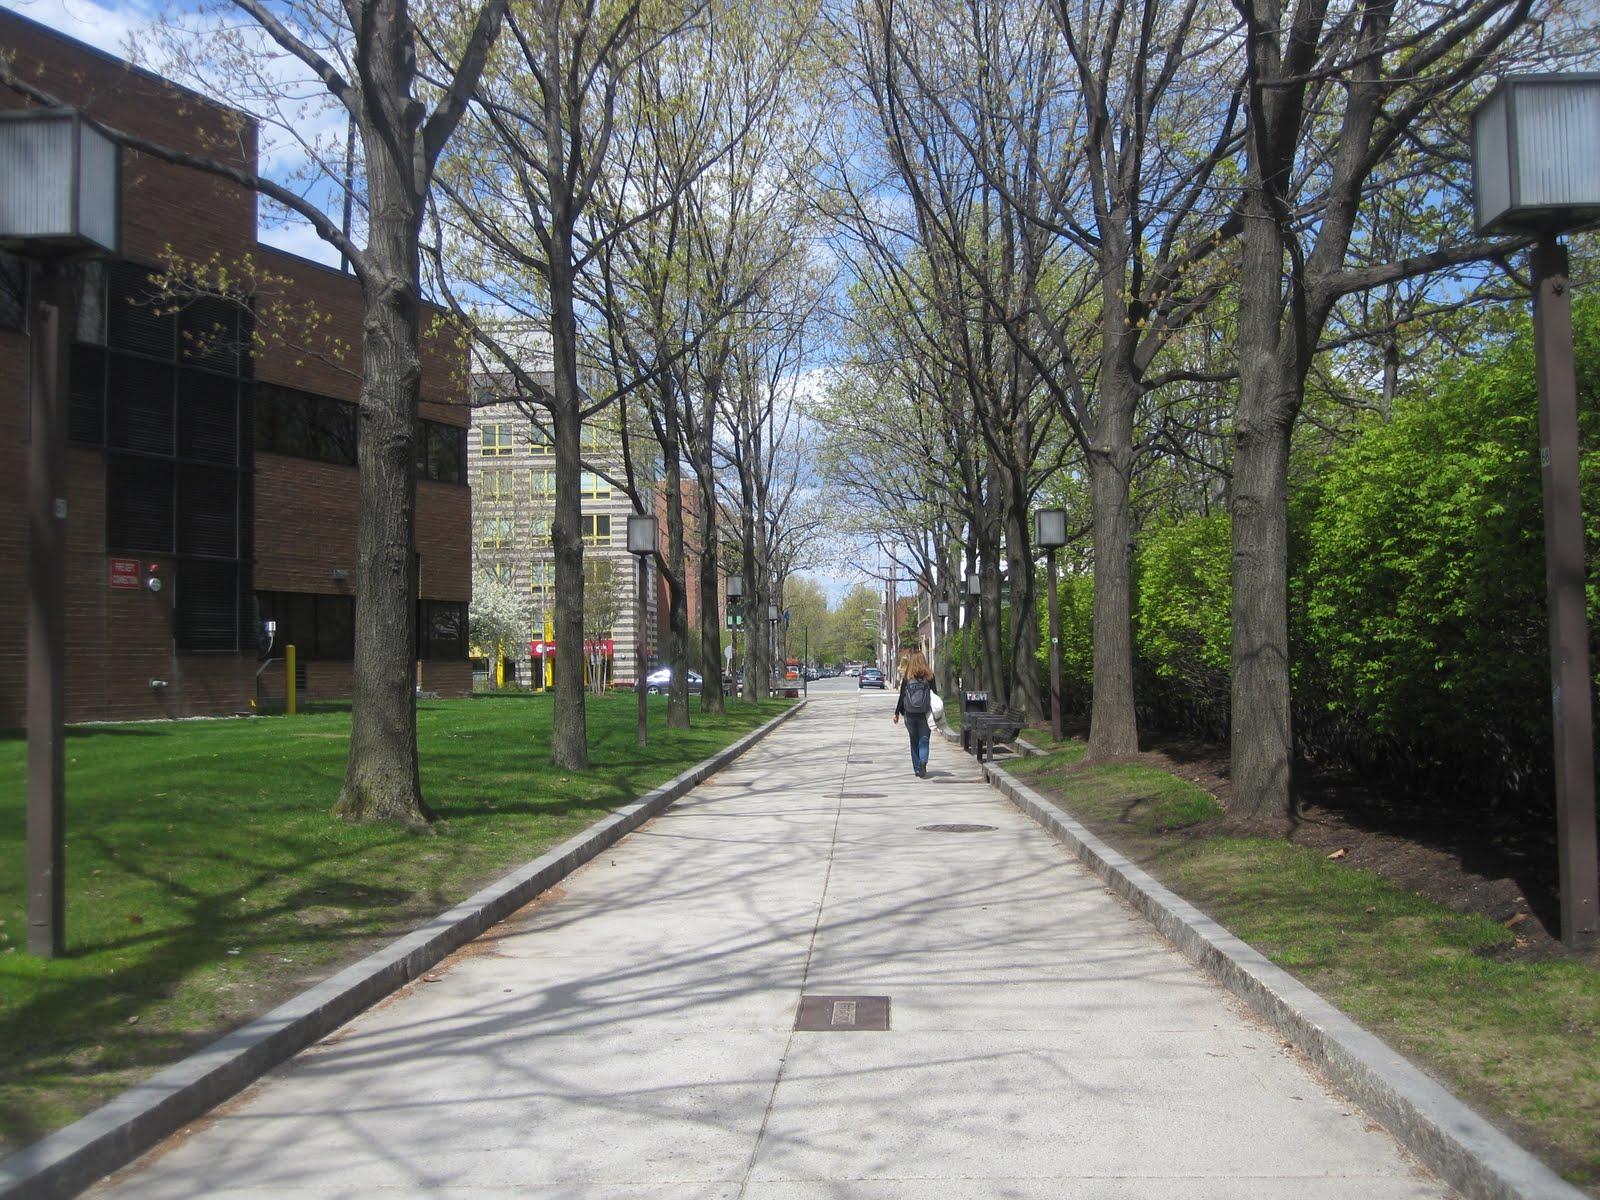 Calm Streets Boston: Effective Crosswalk At Binney & 6th